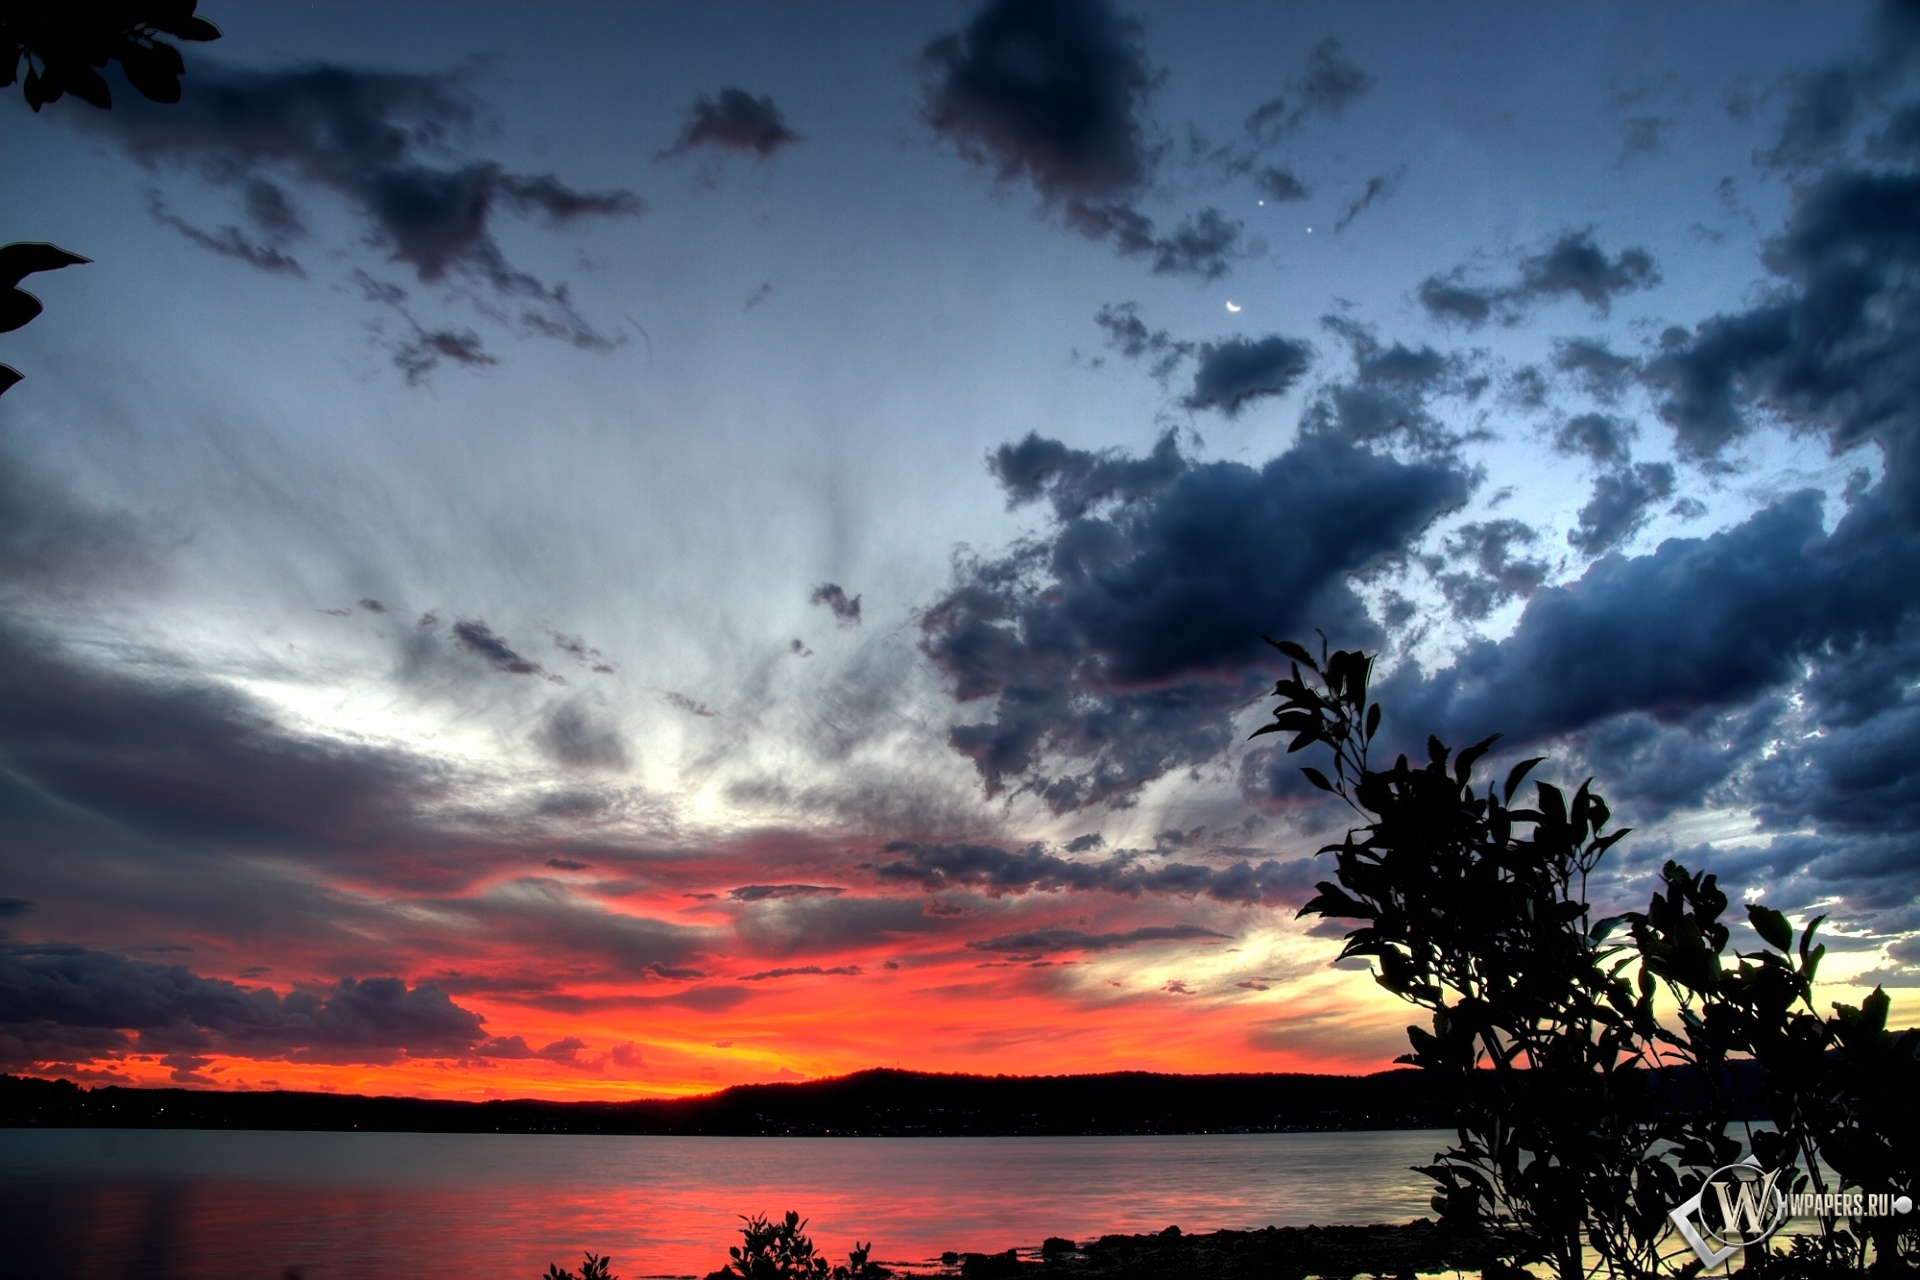 Закат над озером 1920x1280